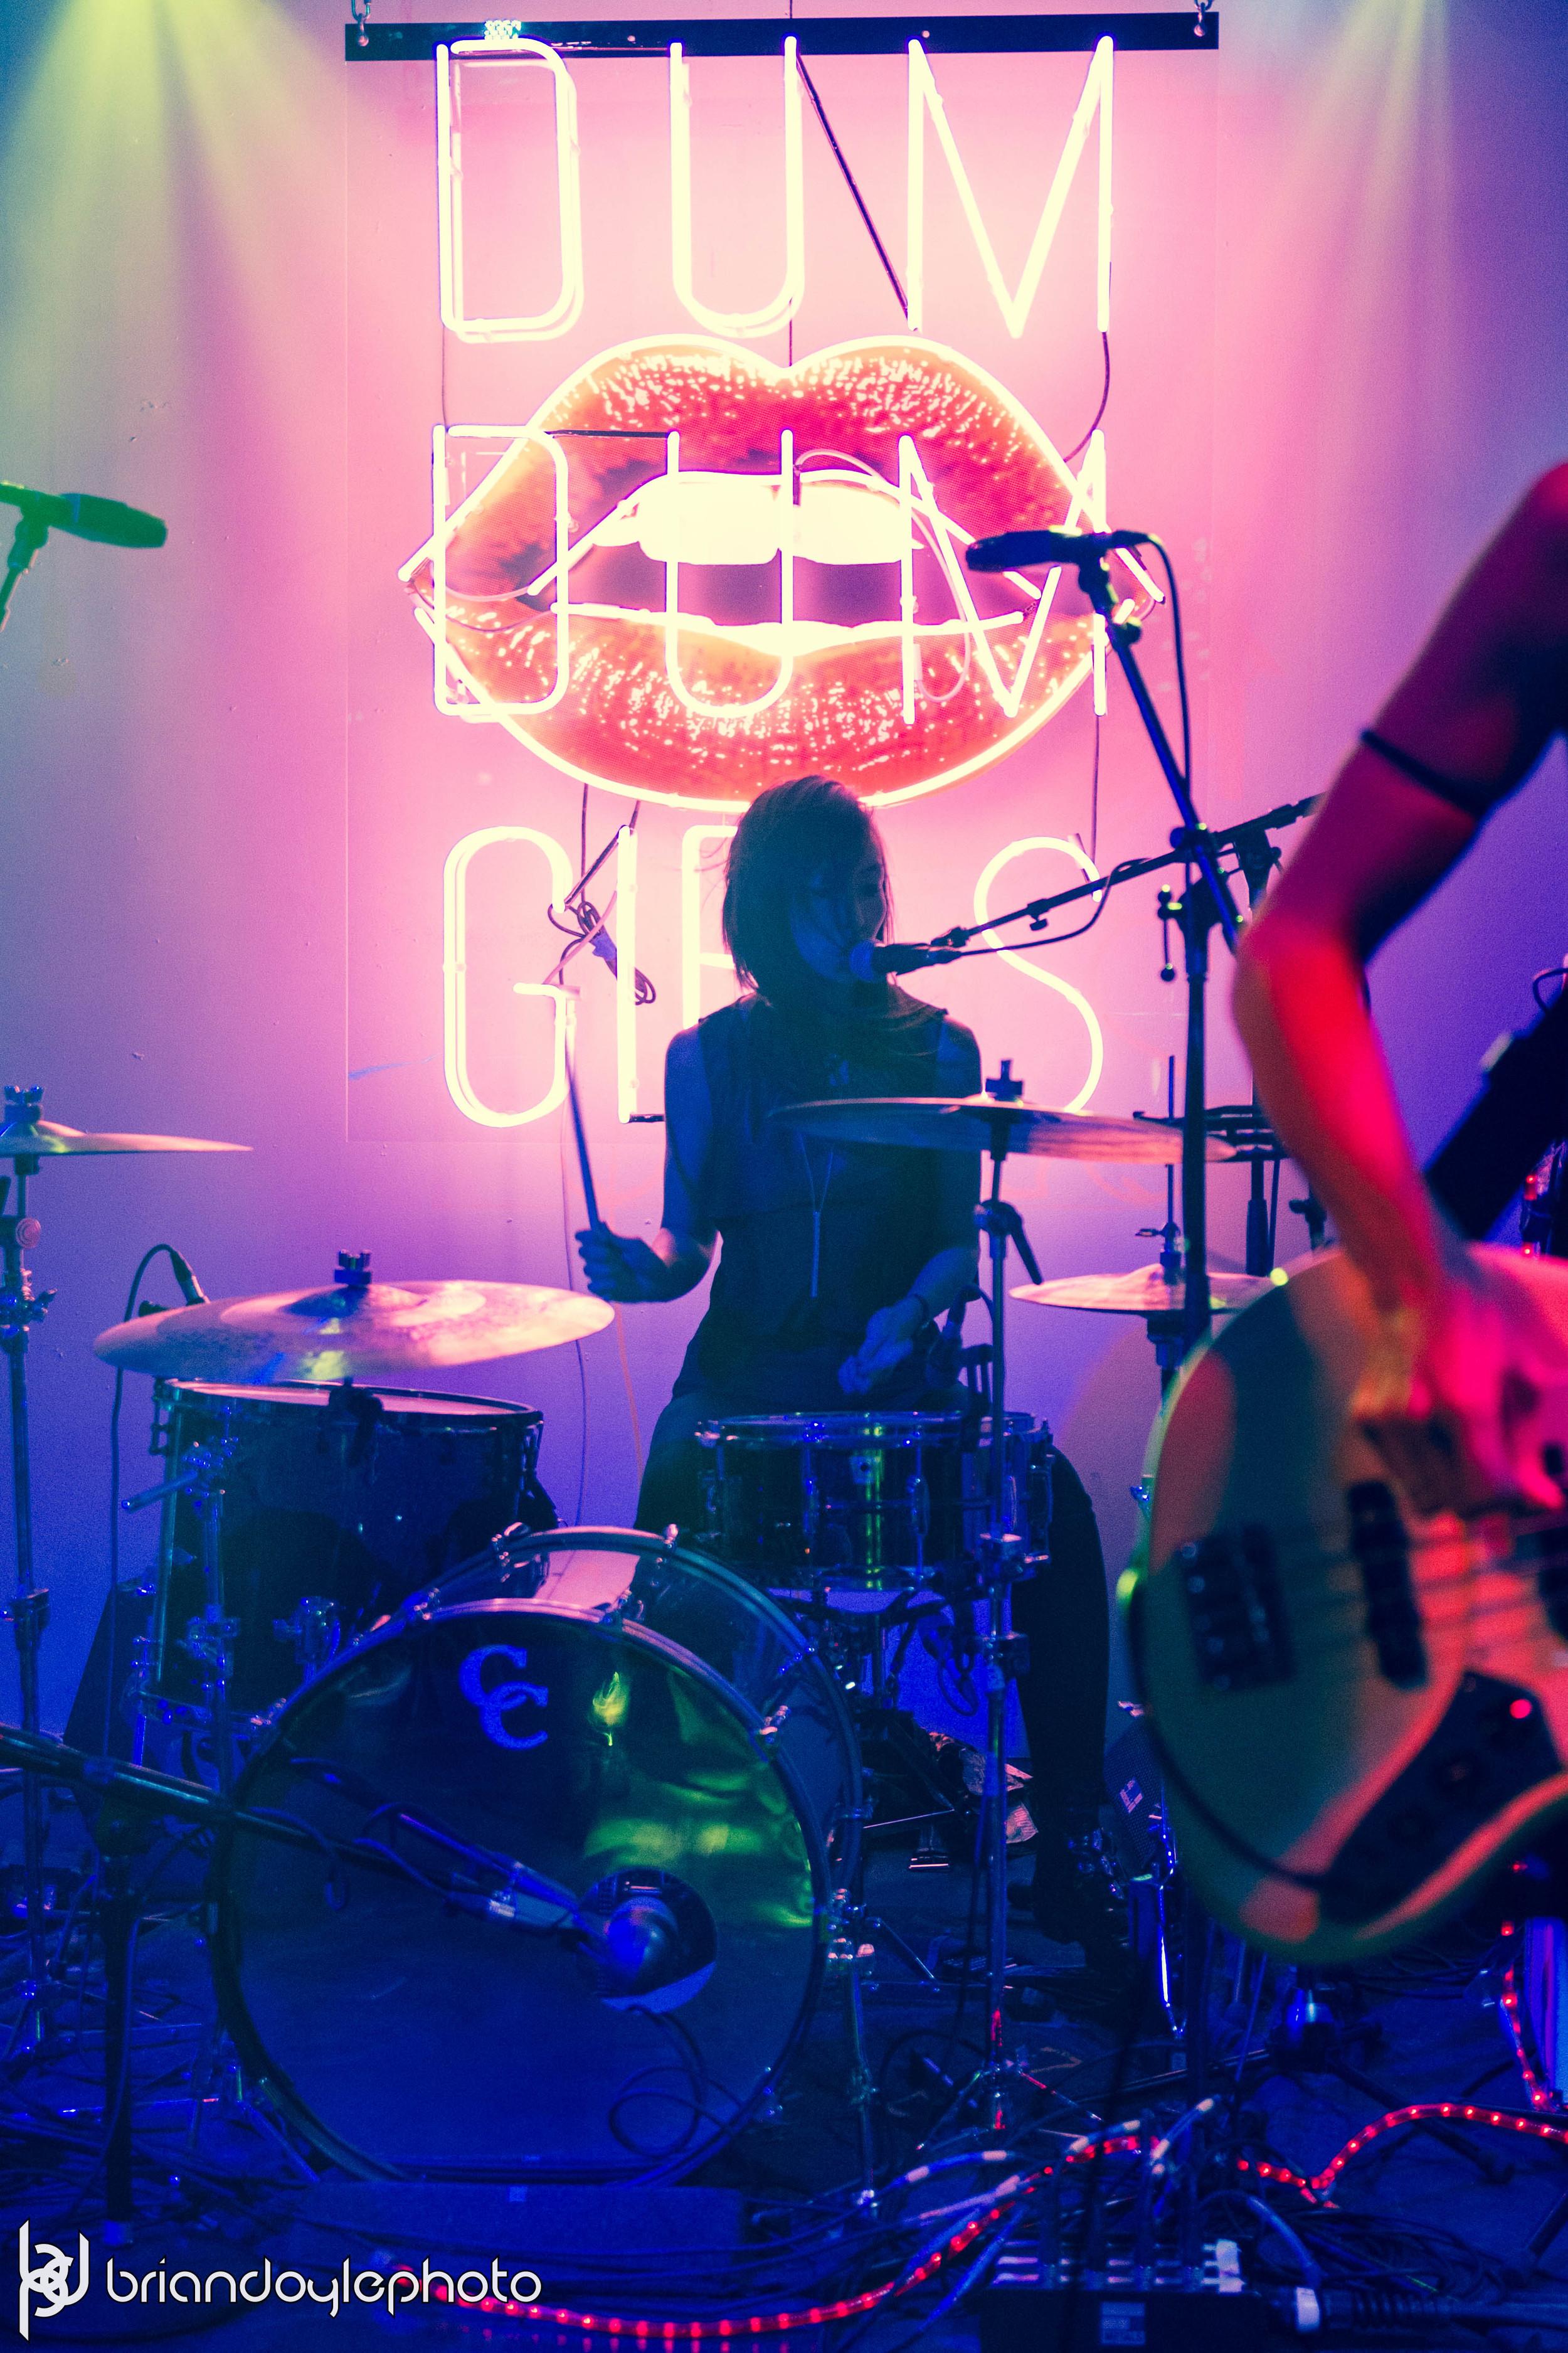 Red Bull - Dum Dum Girls, Tropicana and the Flea, Lowell @ The Well 2014.11.16-56.jpg